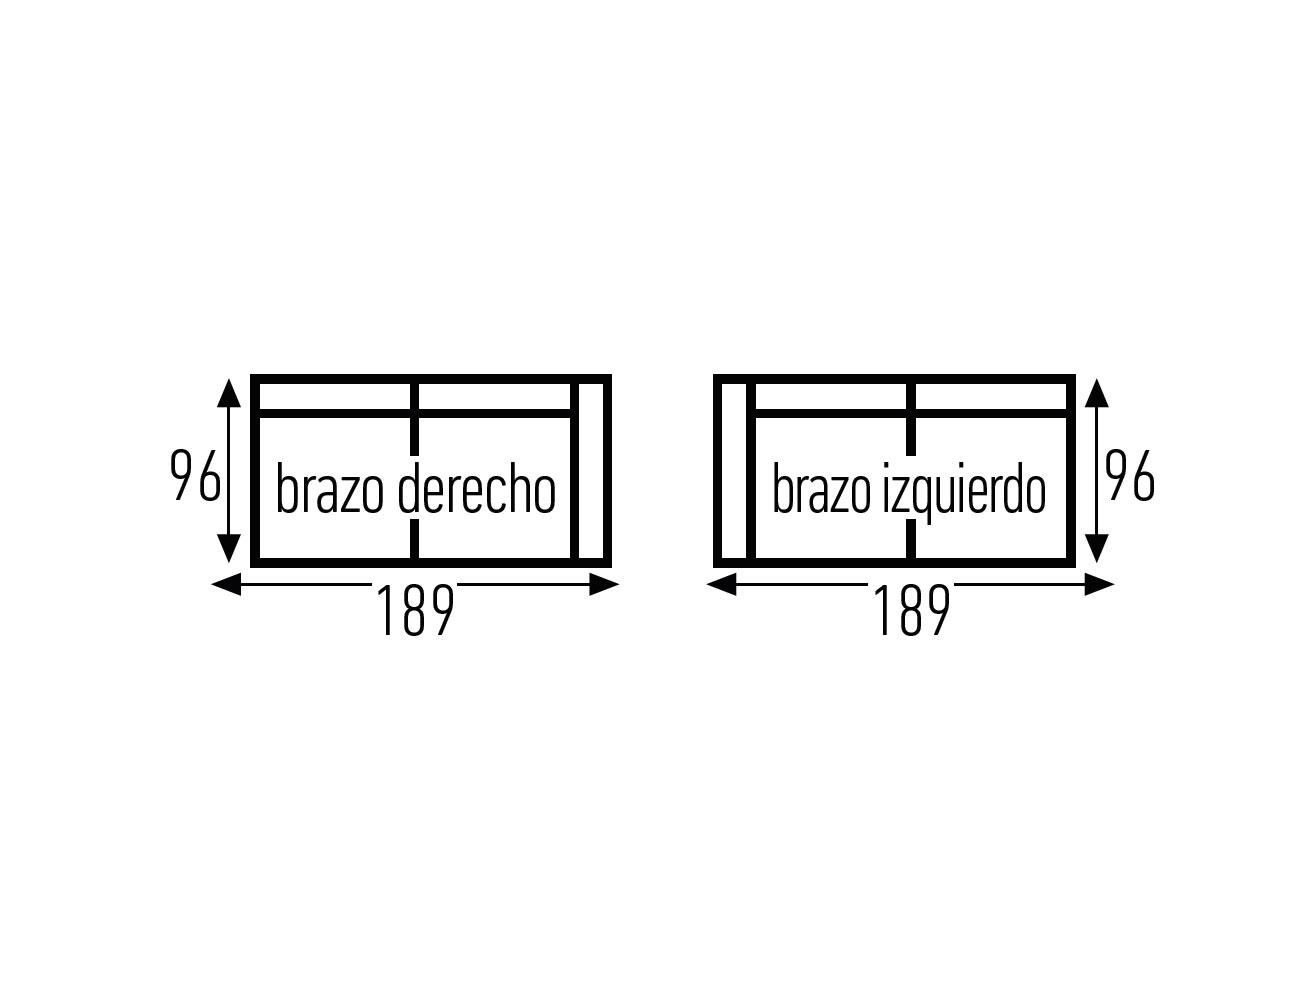 Croquis 3p sin 1 brazo 18913